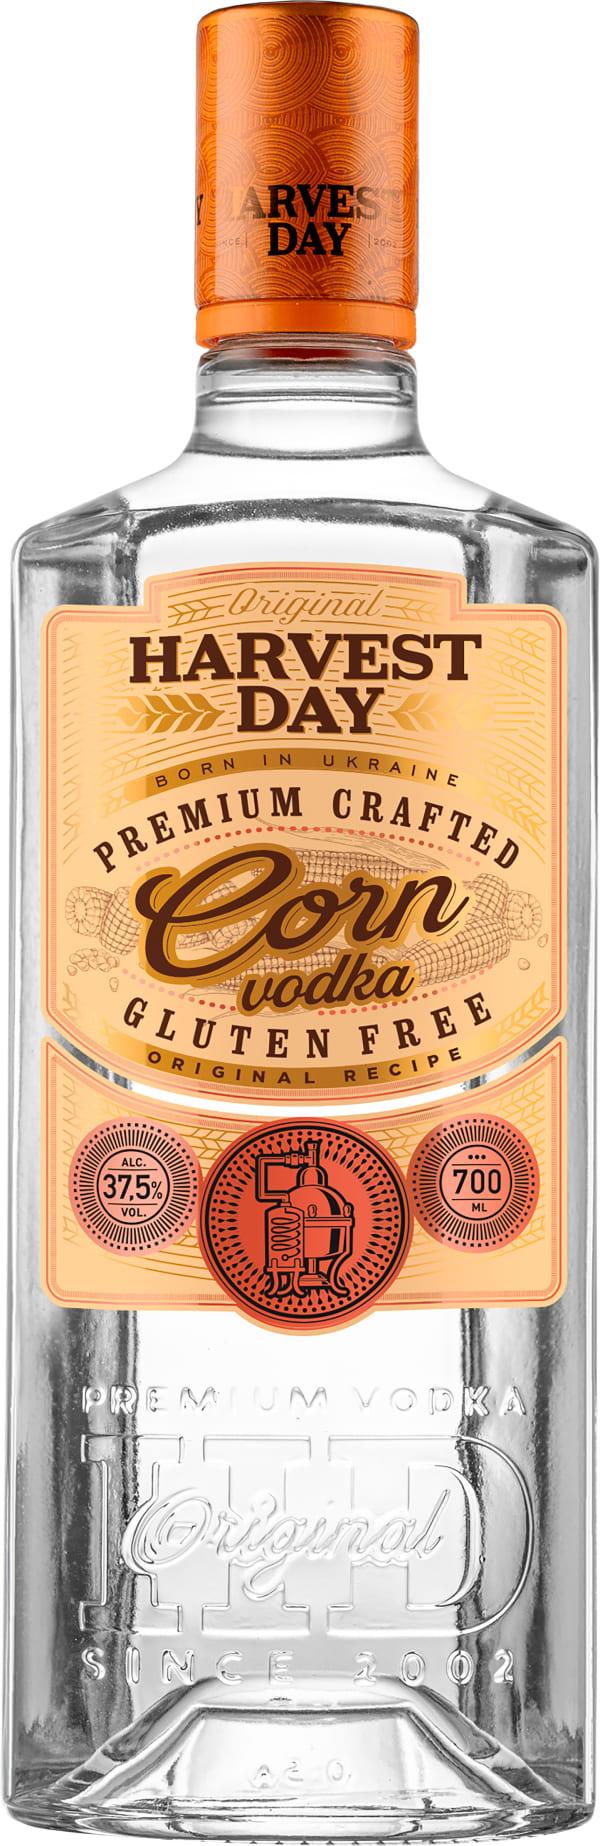 Harvest Day Corn vodka